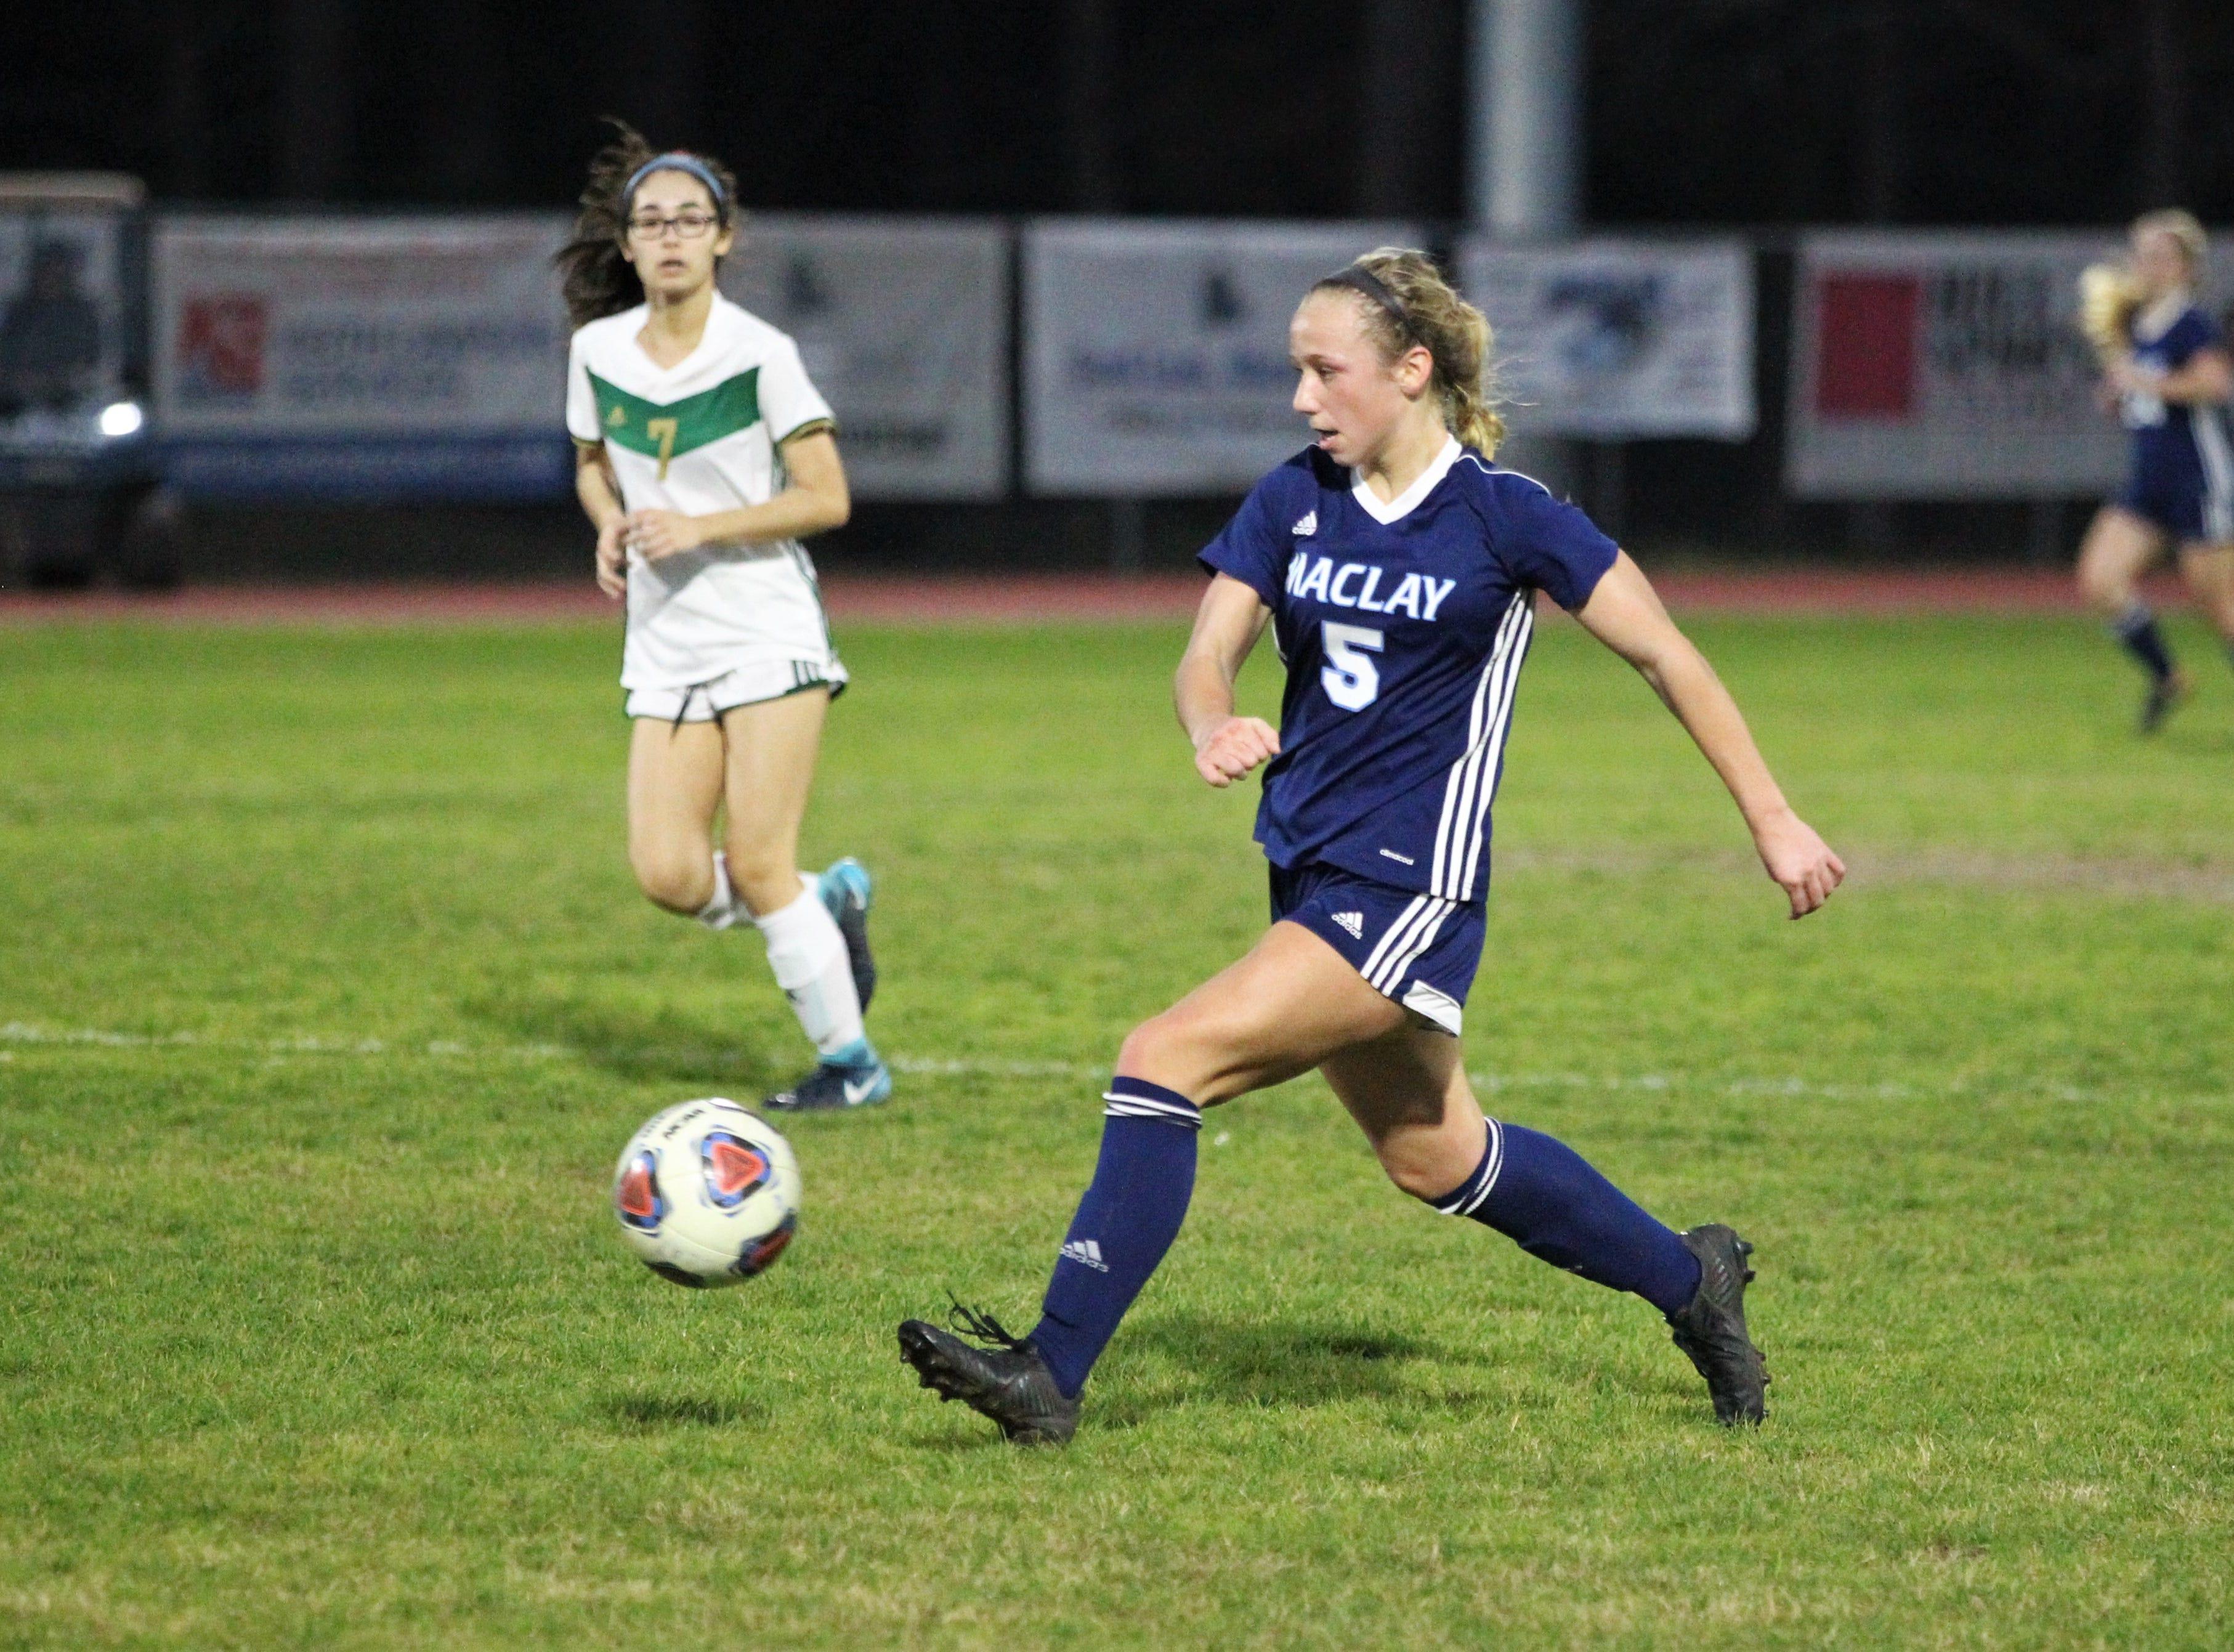 Maclay's Katelyn Dessi dribbles through the midfield as Maclay's girls soccer team beat St. Joseph Academy 4-0 in a Region 1-1A quarterfinal on Jan. 5, 2019.